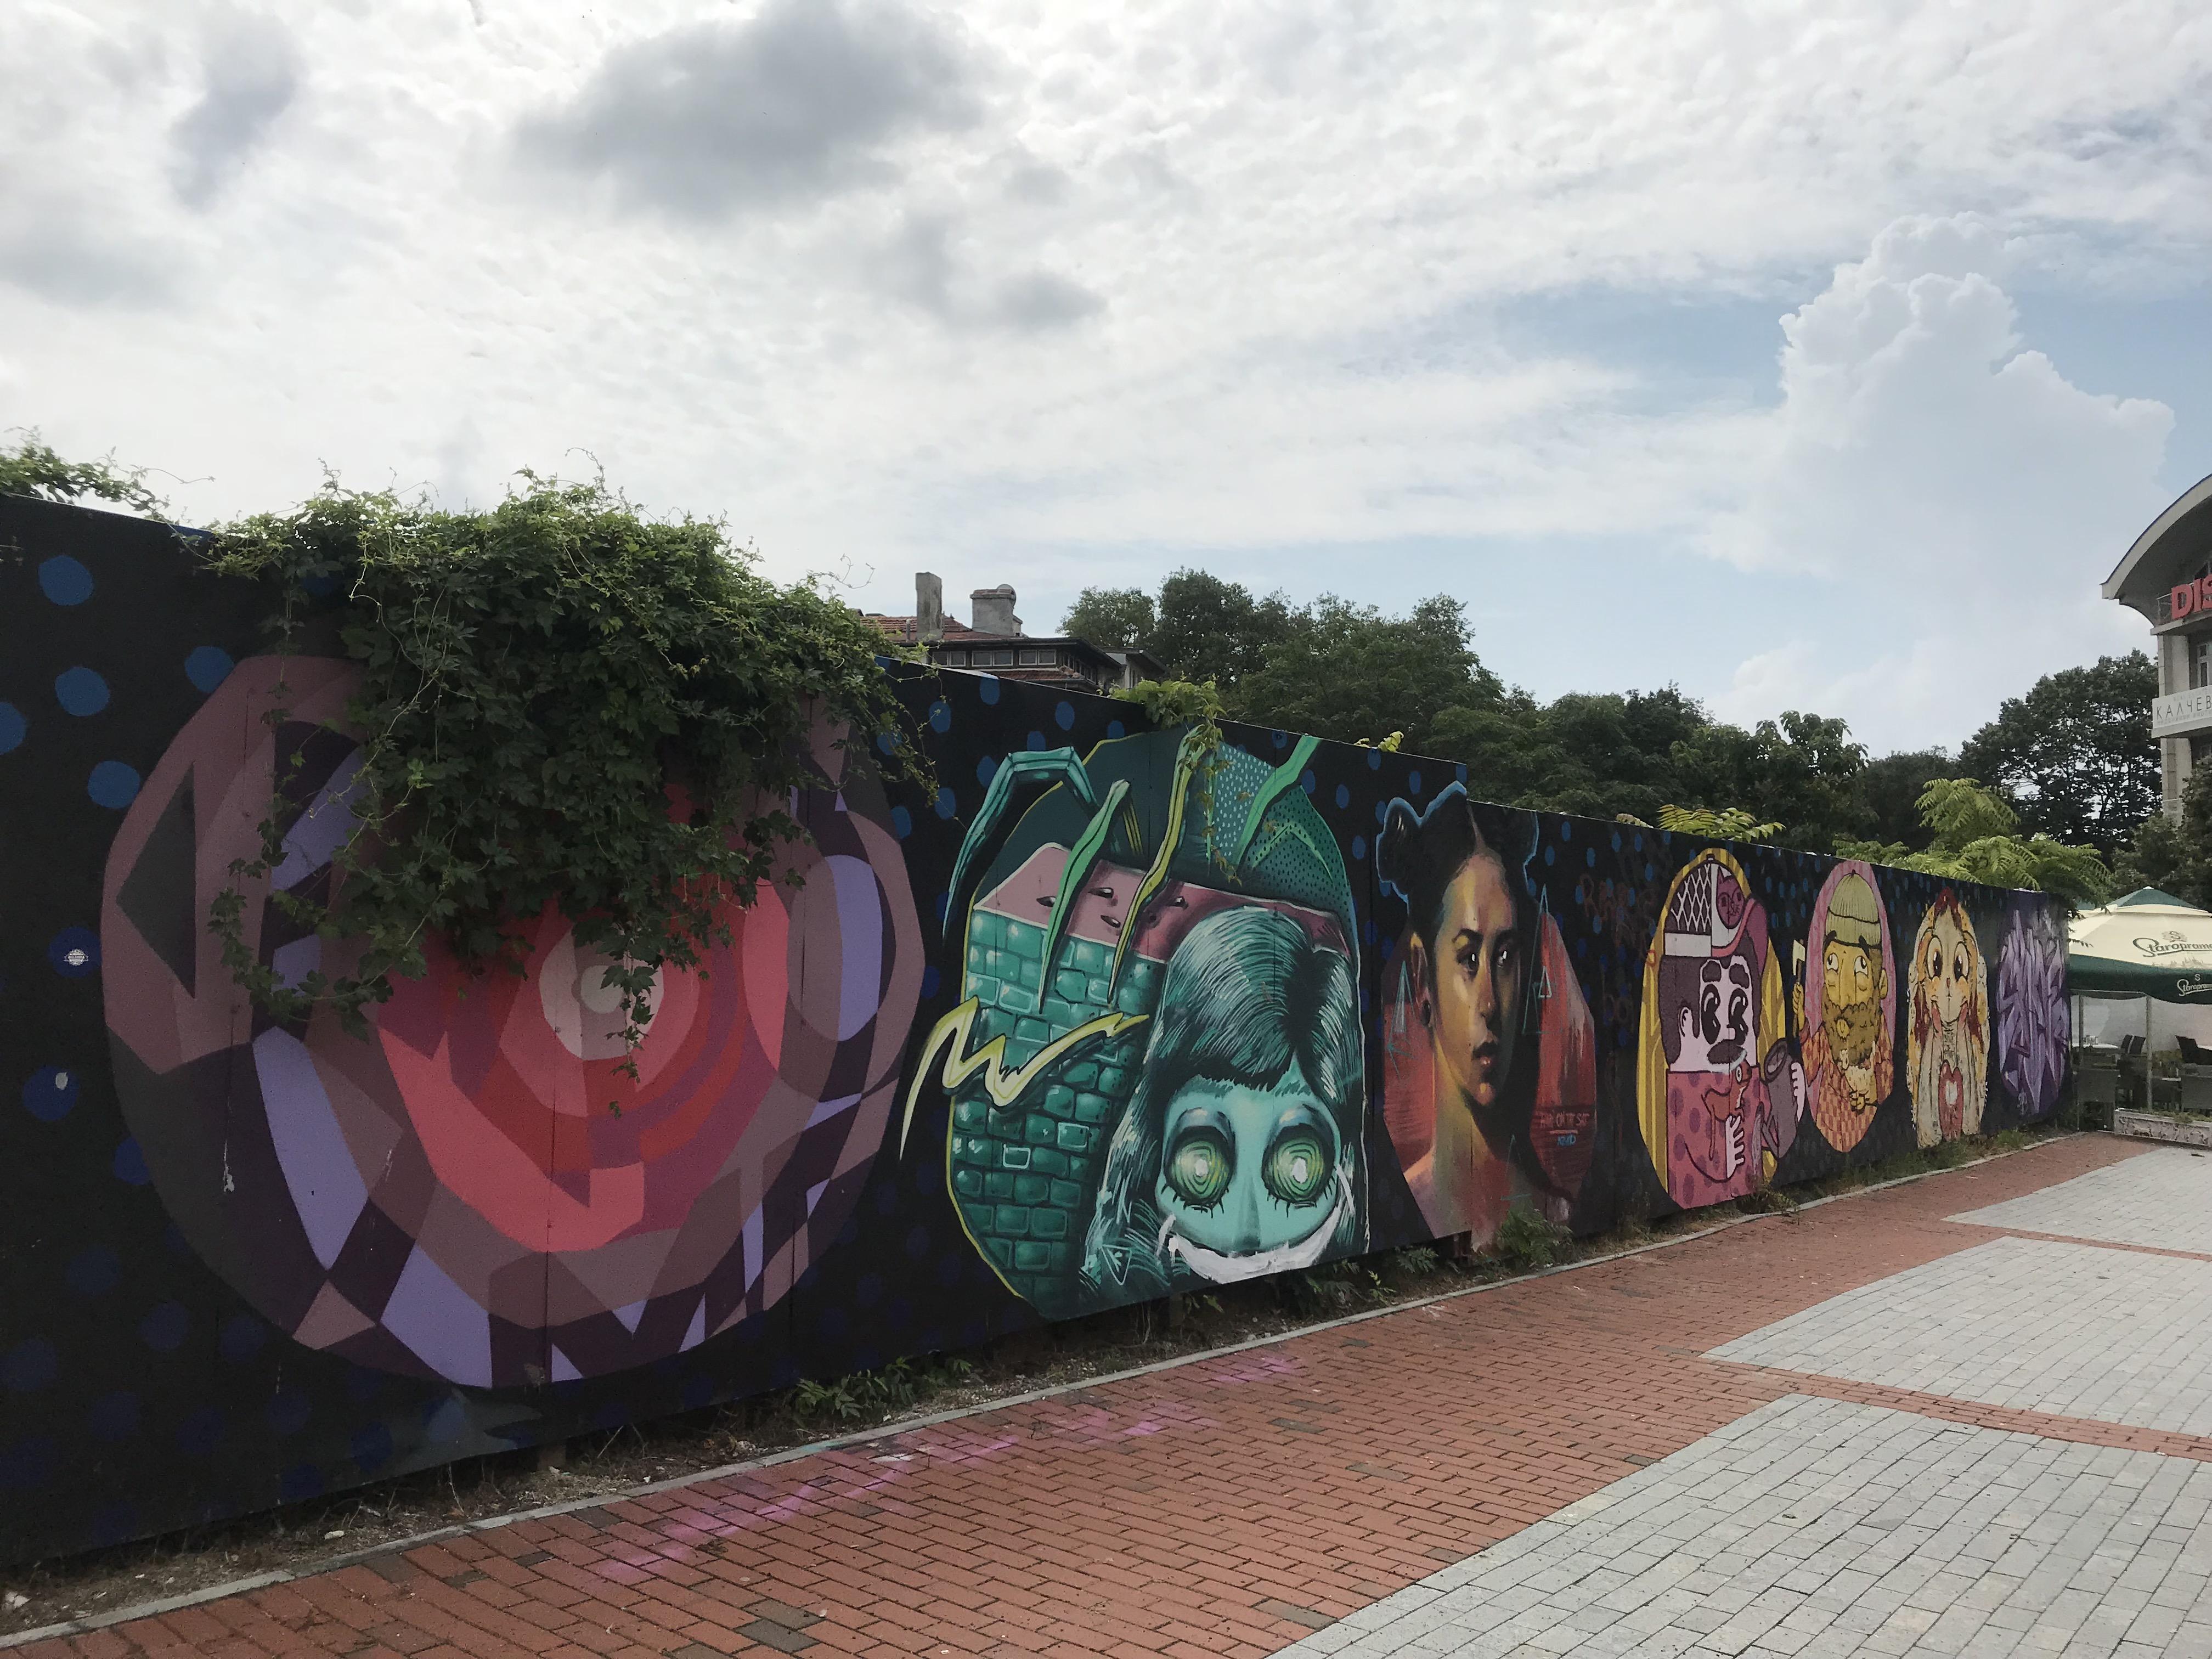 street art in Varna, Bulgaria